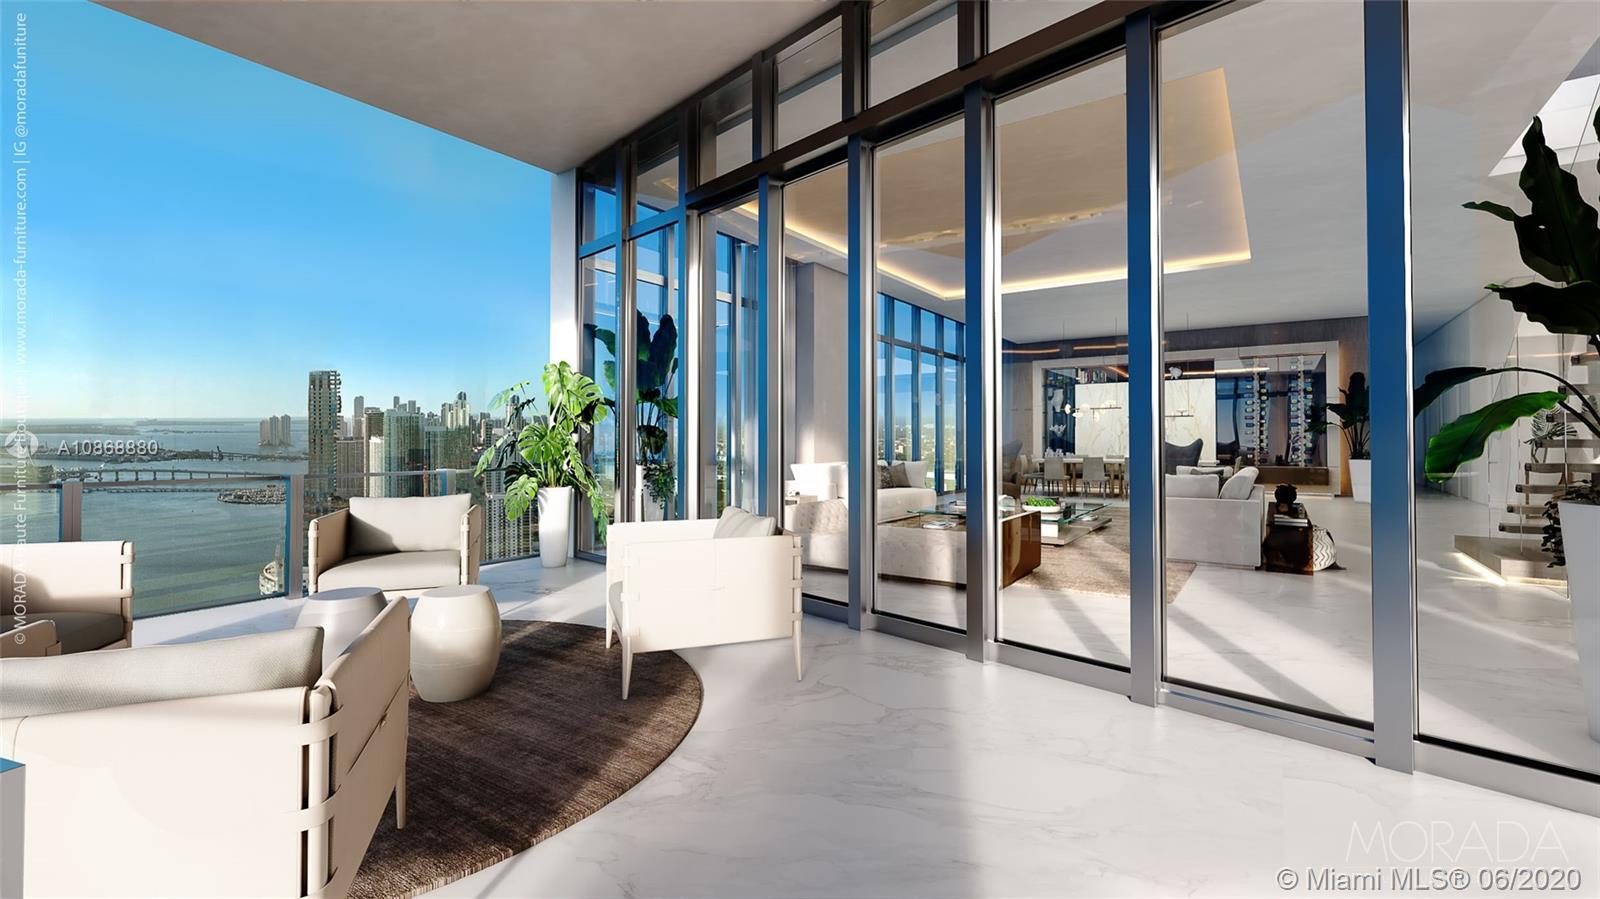 2900 NE 7th Ave, Unit #5102 Luxury Real Estate